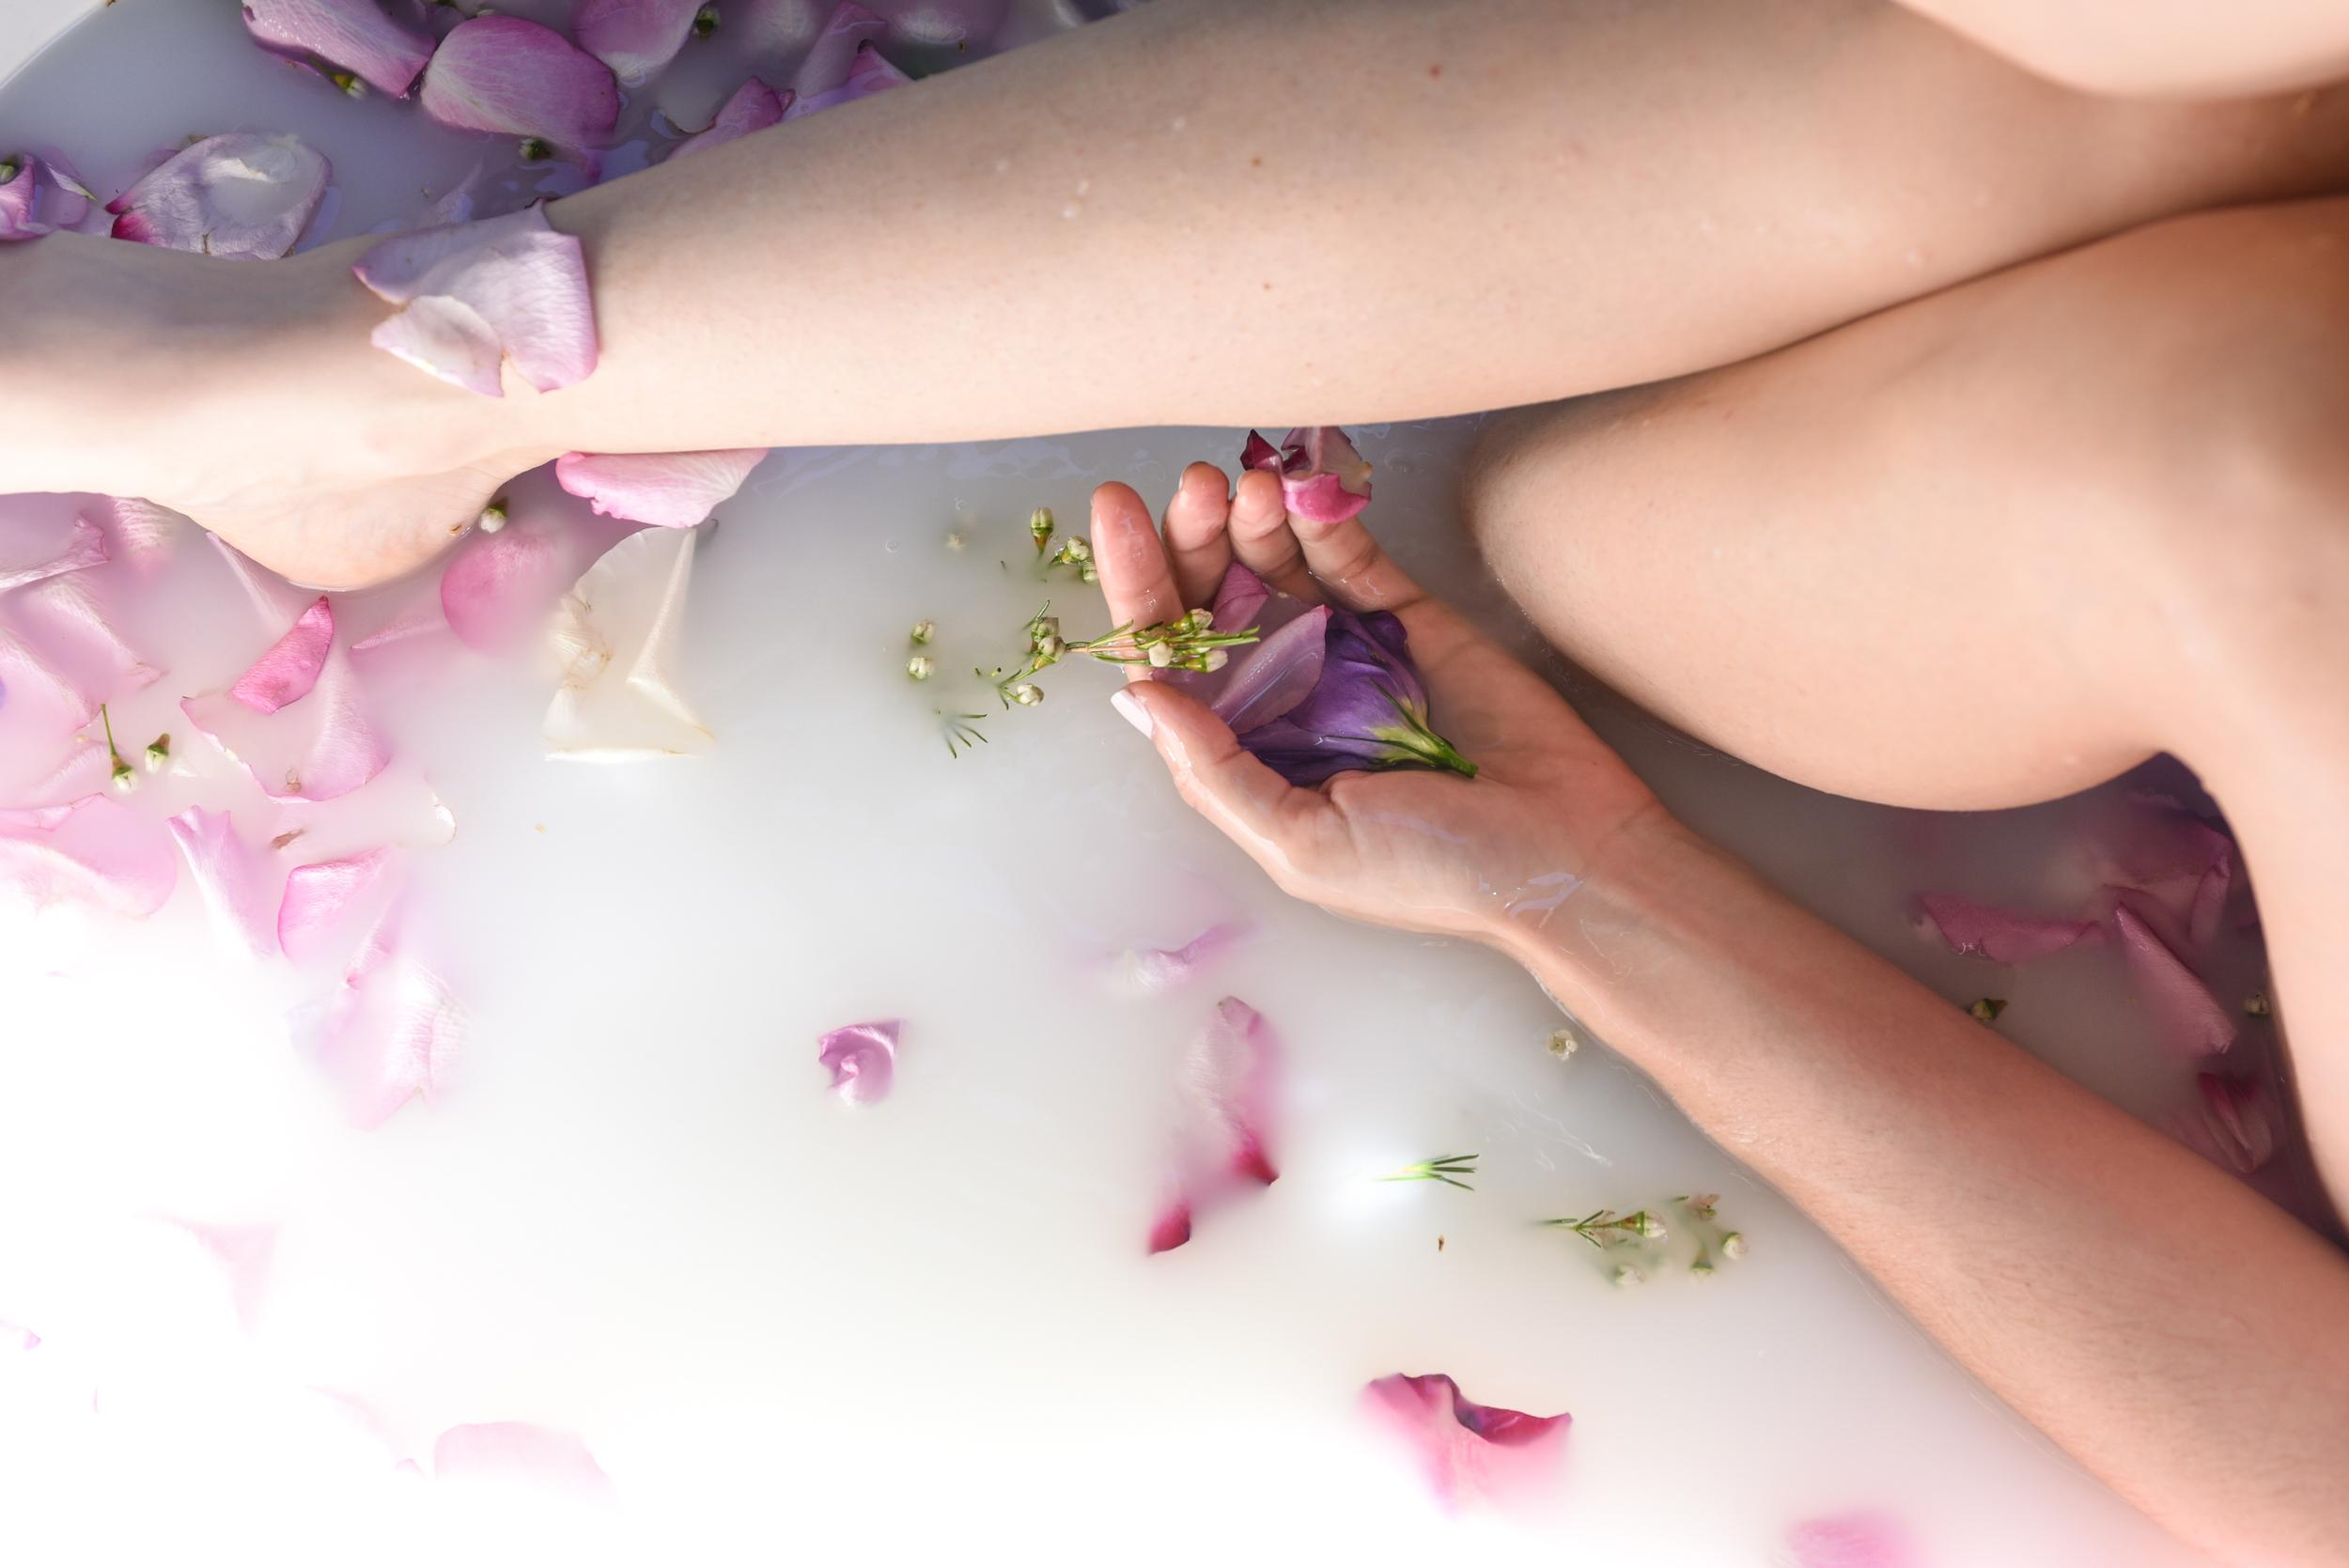 rose bath, milk bath, flores lane candles, boho bunnie, joshua tree, rose petal bath, milky bath shoot